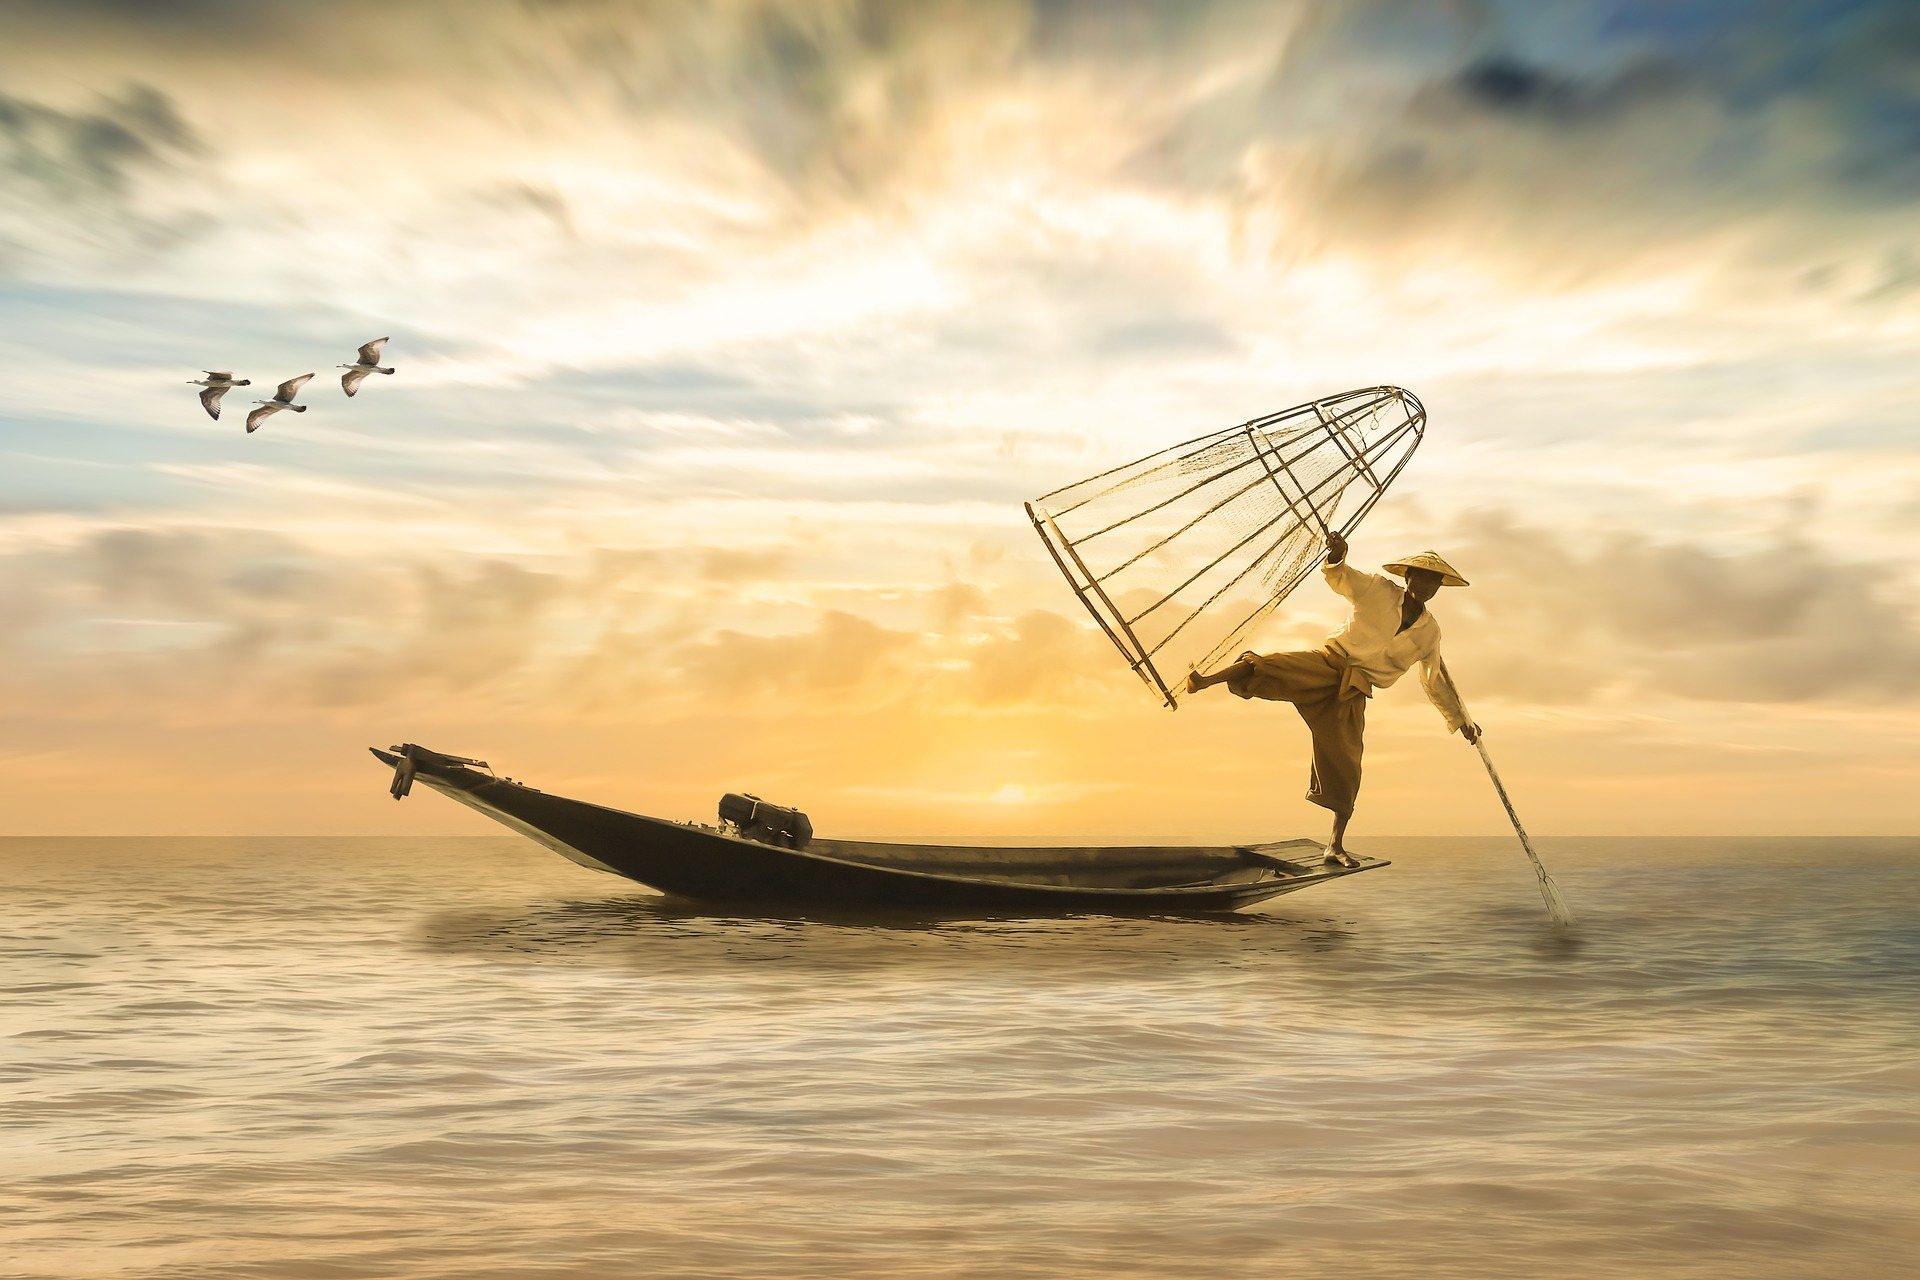 fisherman-2739115_1920.jpg